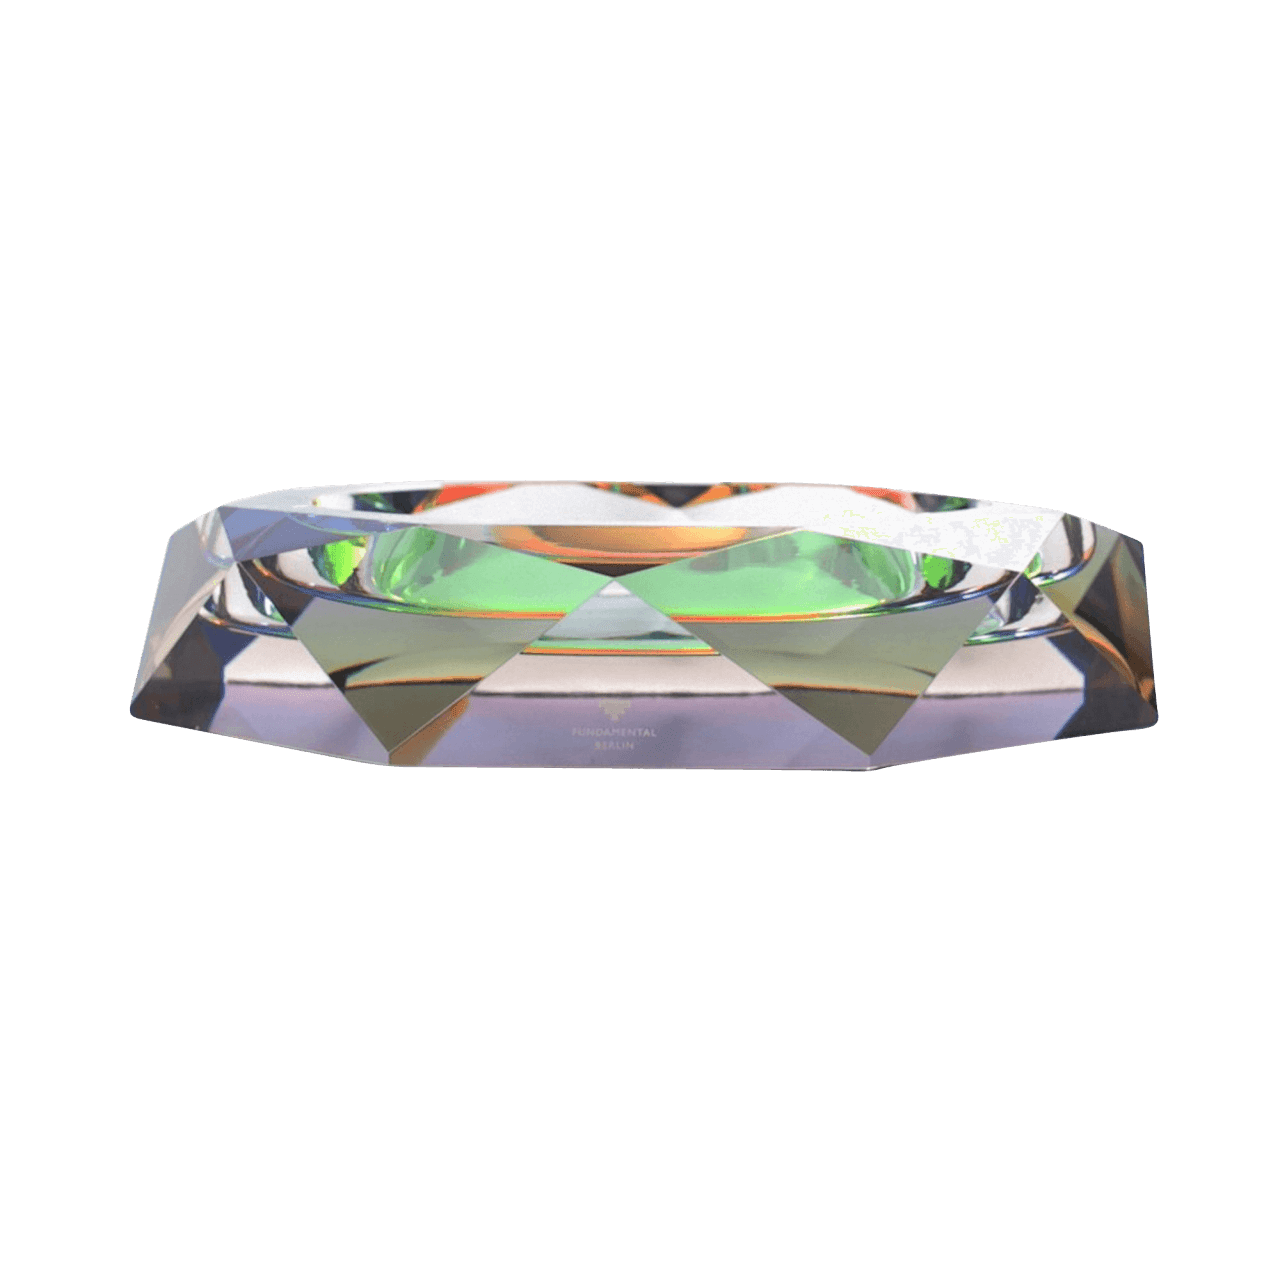 Regenbogen Bowl Schale